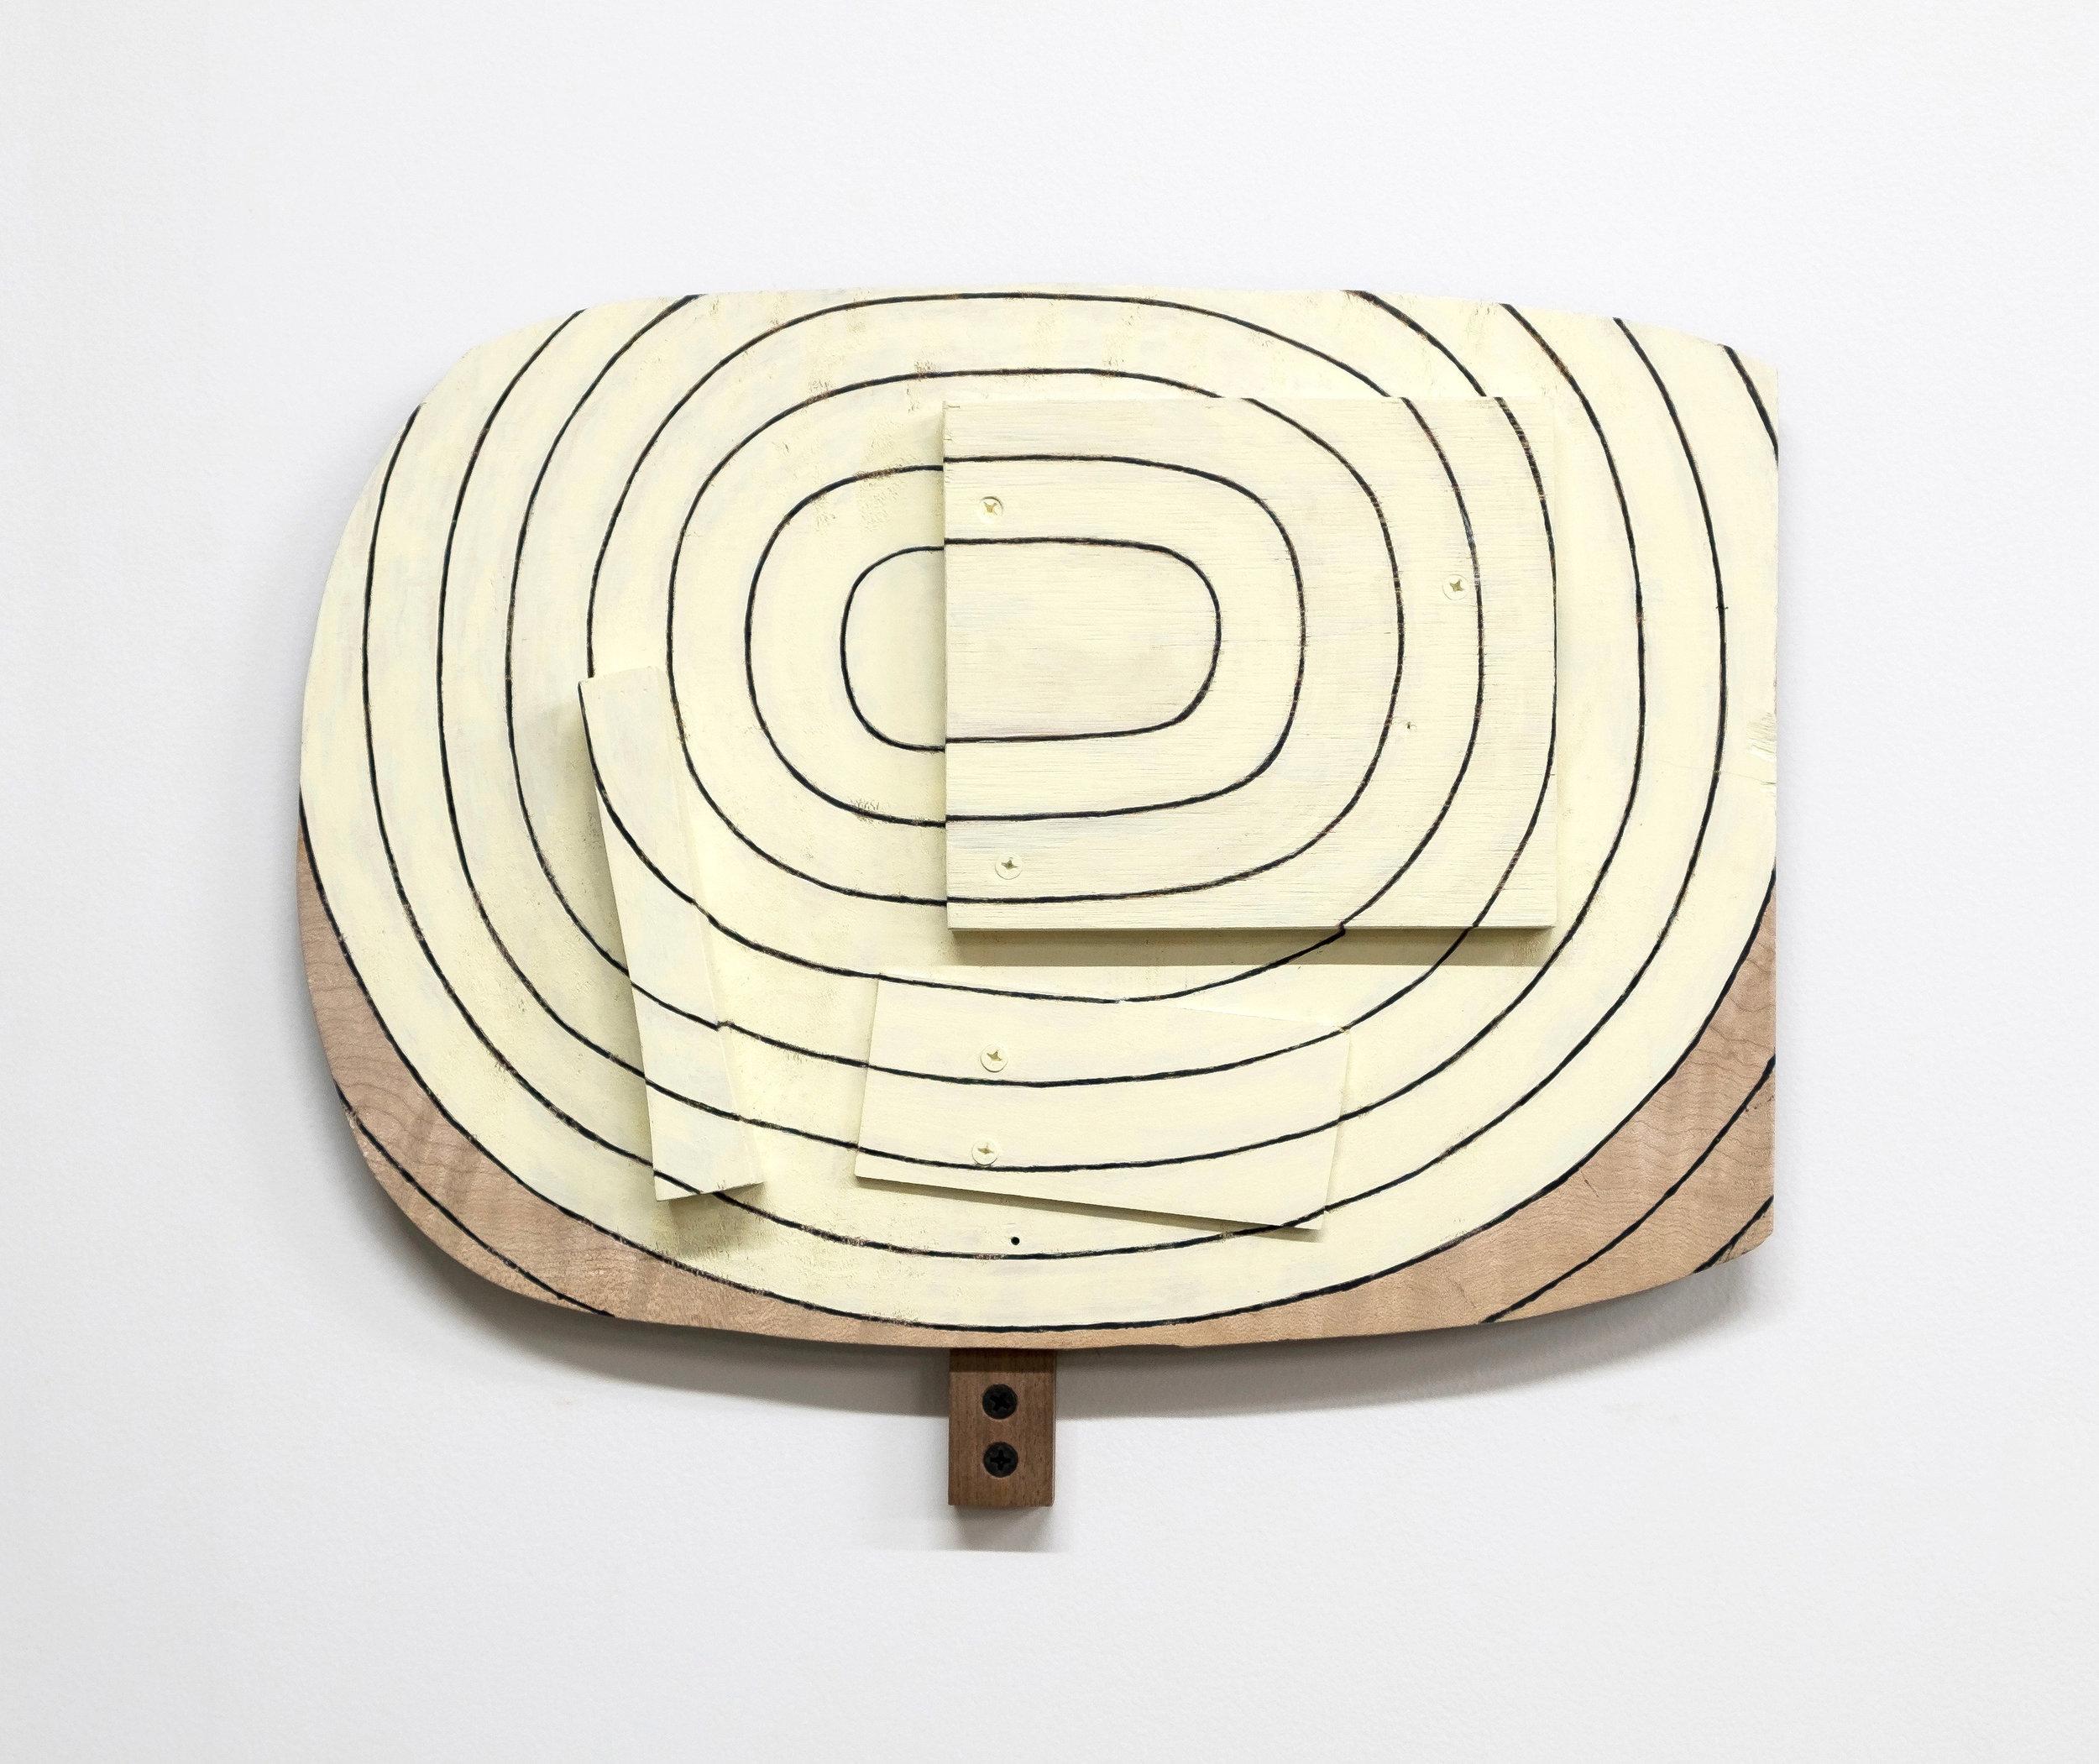 "Untitled, 2019, paint, wood, screws, 12 x 14 x 2"""